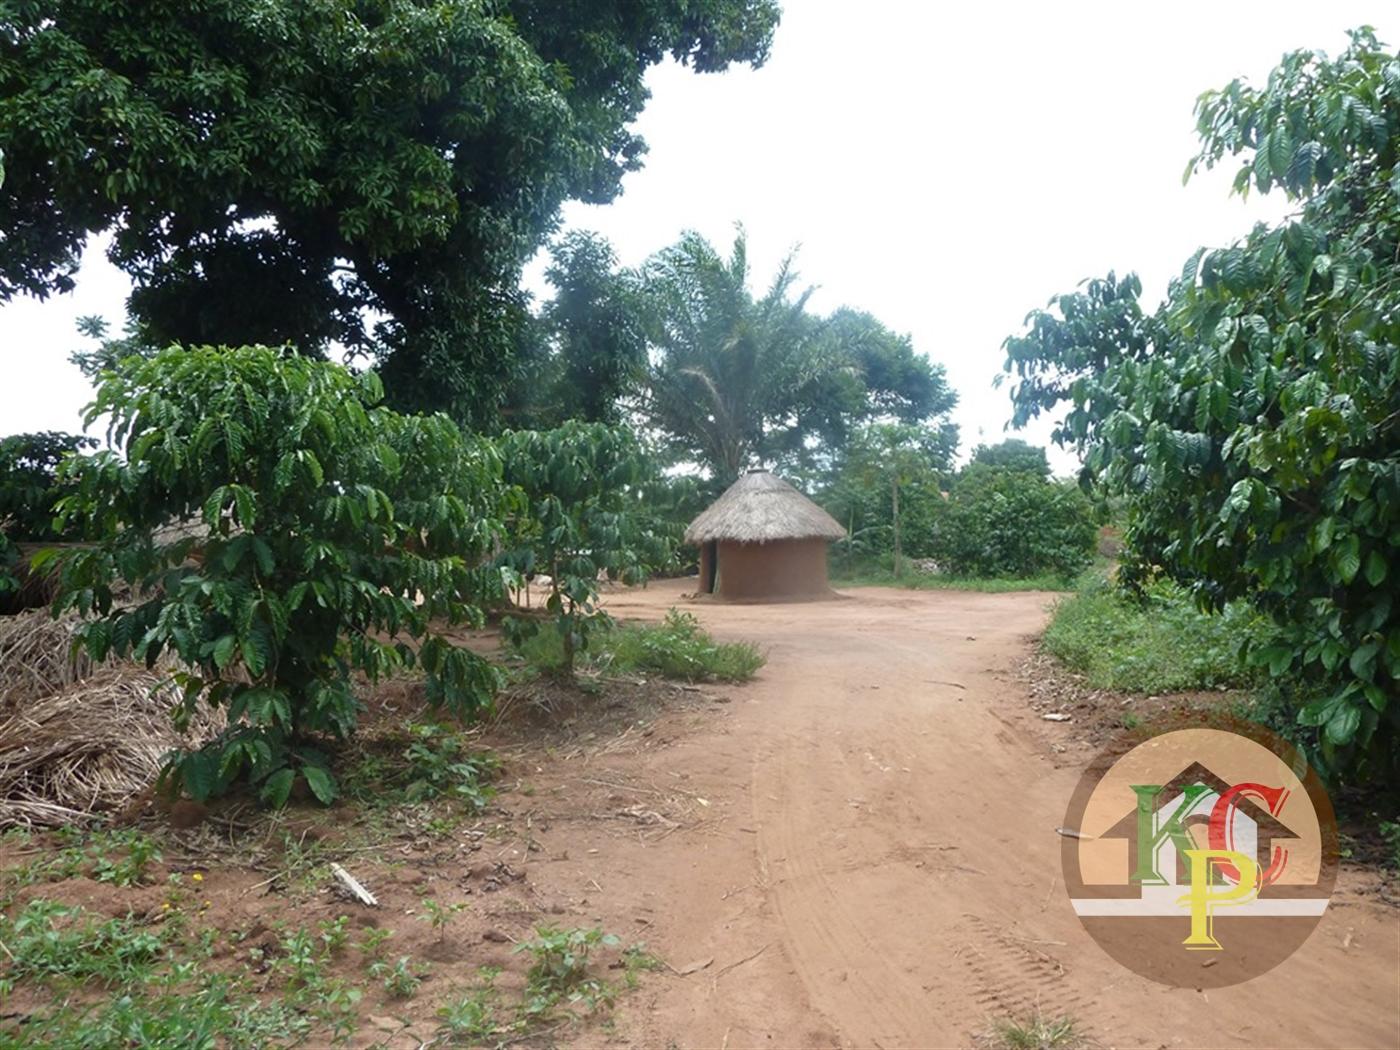 Residential Land for sale in Zirobwe Luwero